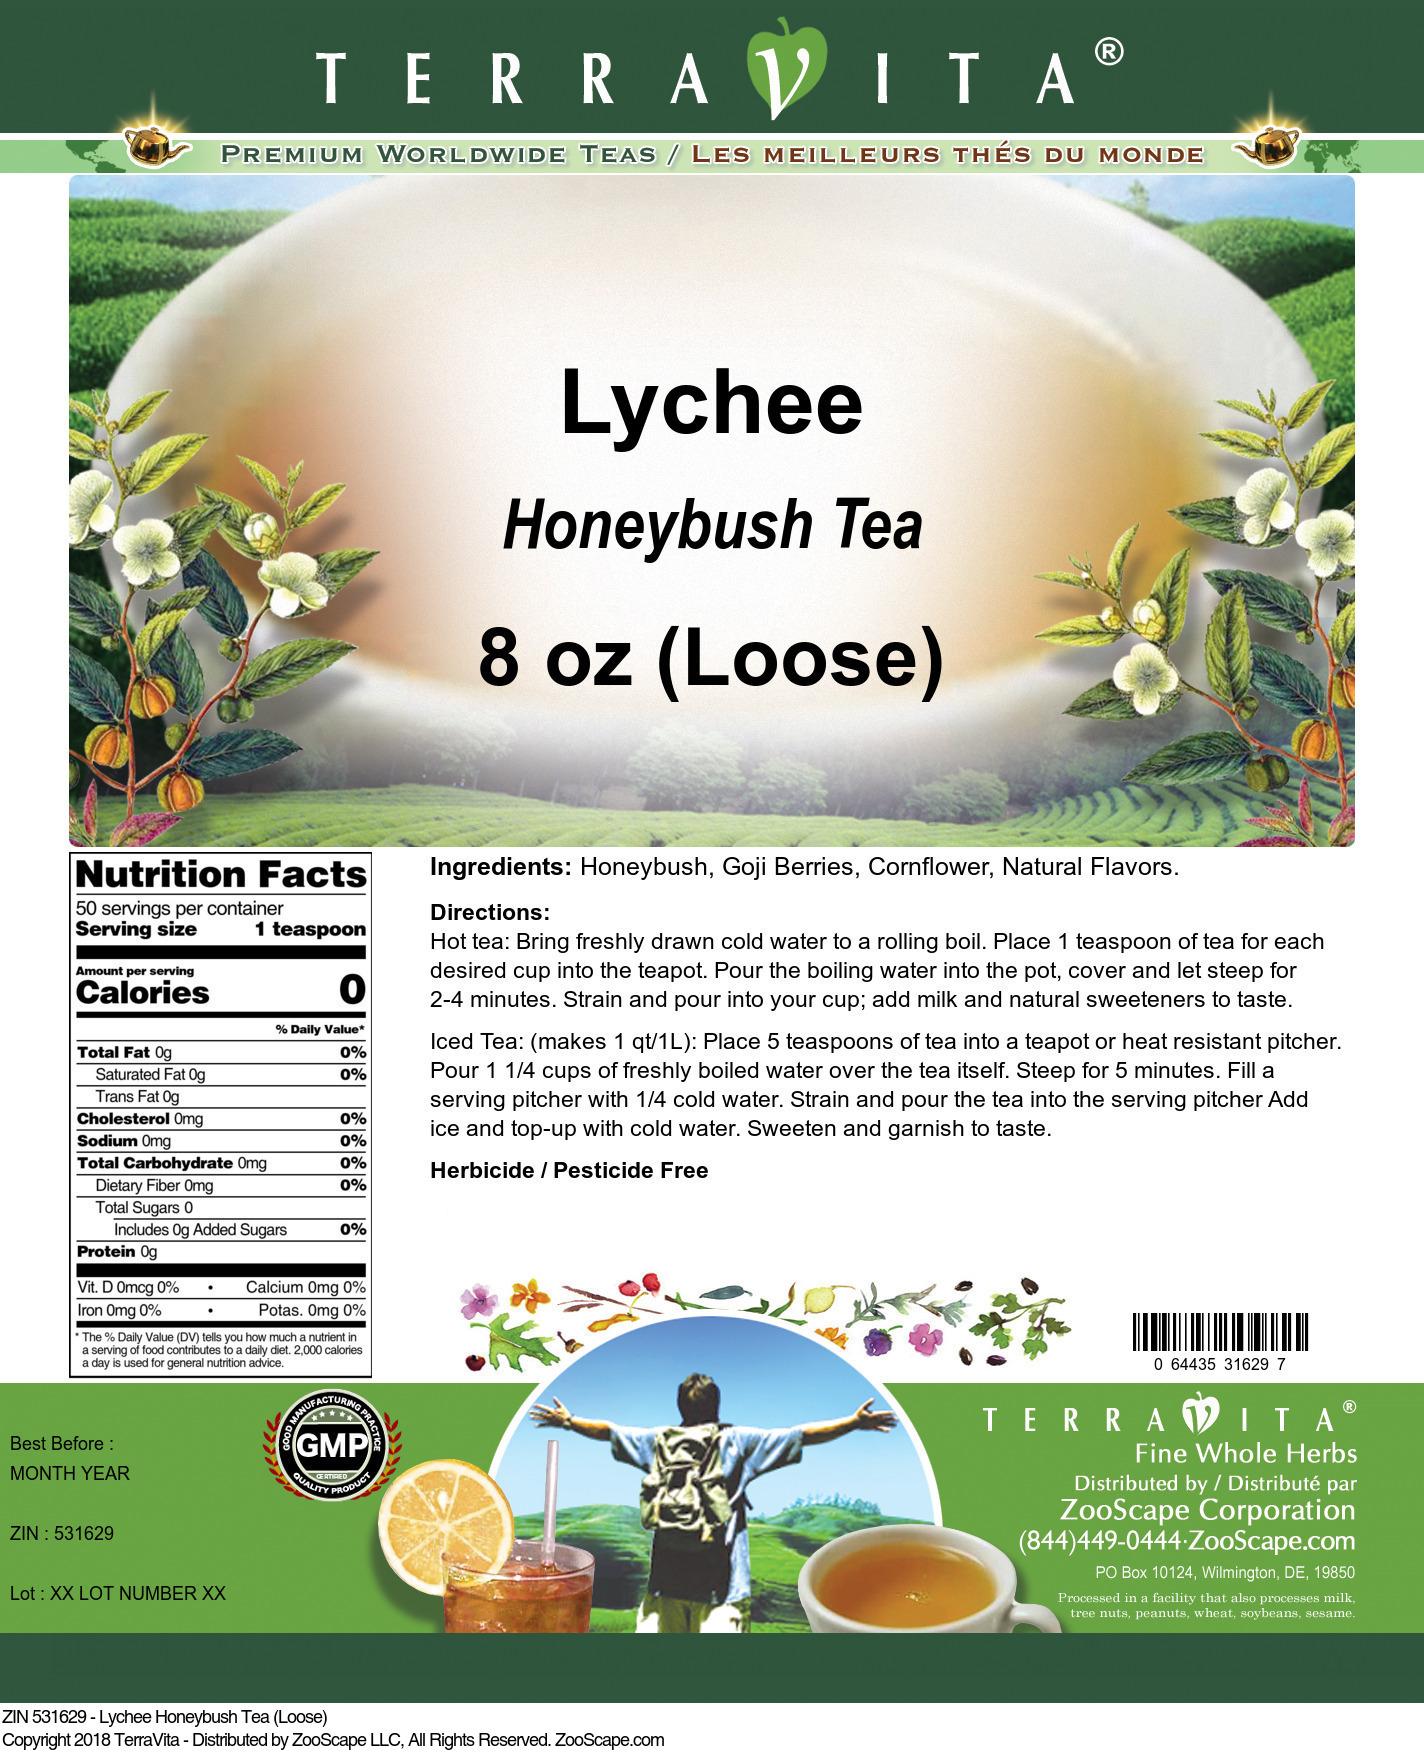 Lychee Honeybush Tea